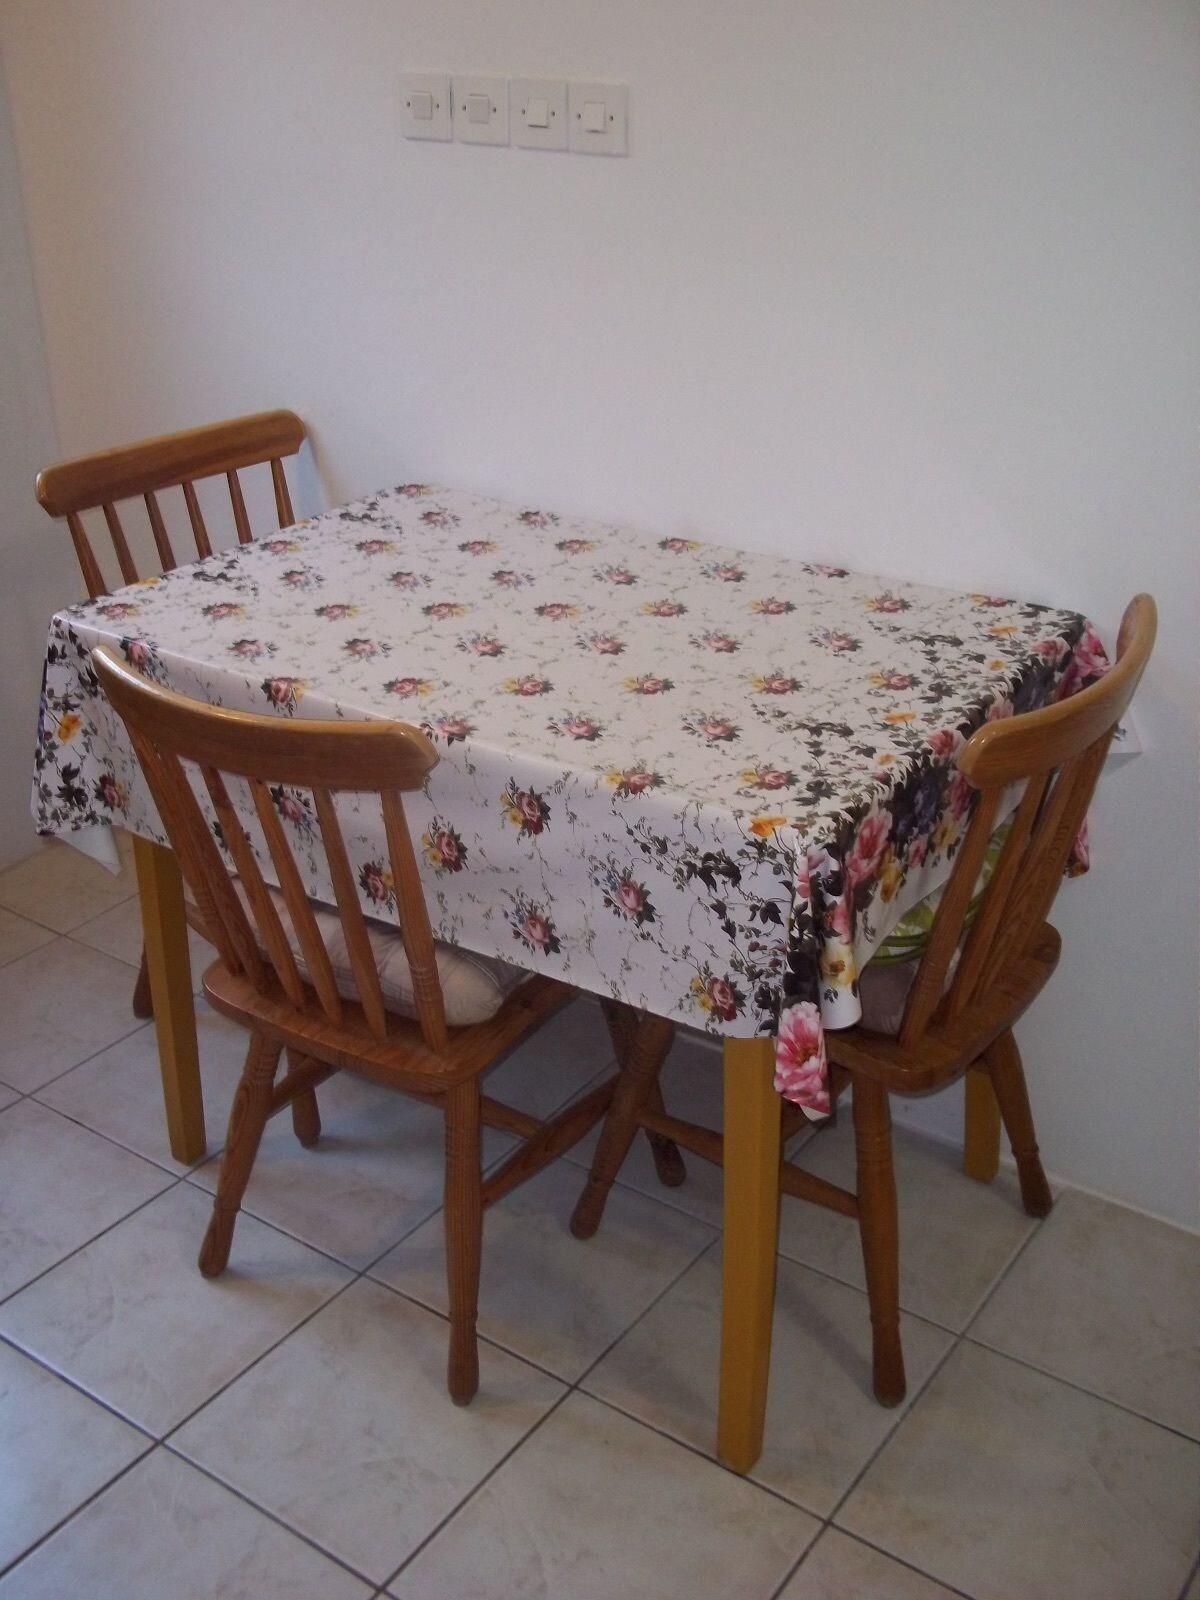 Anita - Apartment Jasmina, Mali Lošinj